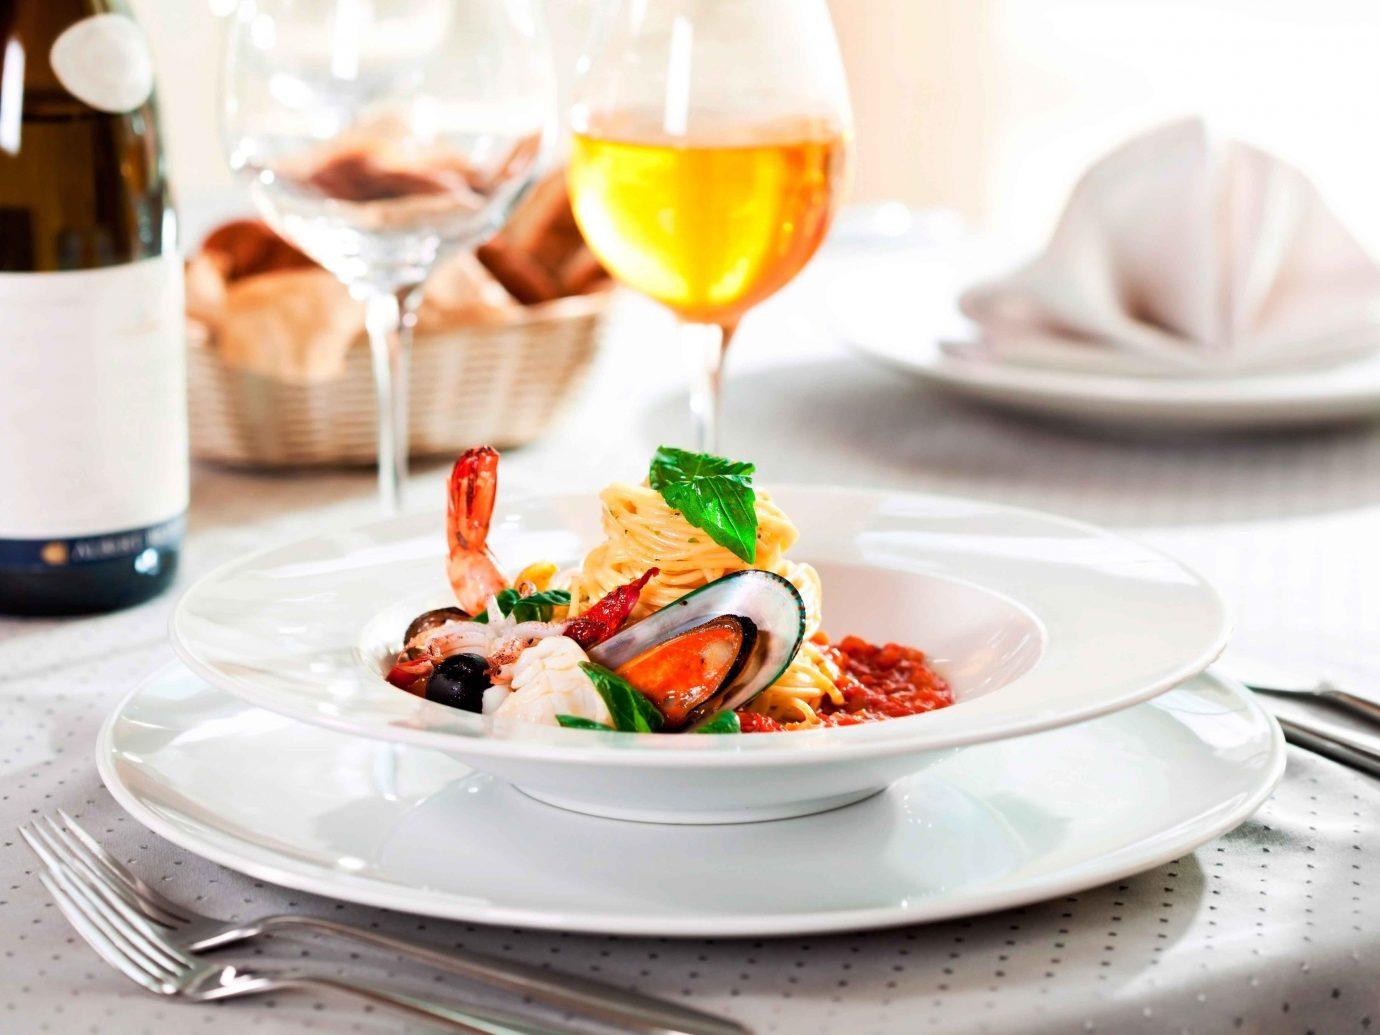 Food + Drink plate table dish food meal produce breakfast brunch cuisine sense restaurant